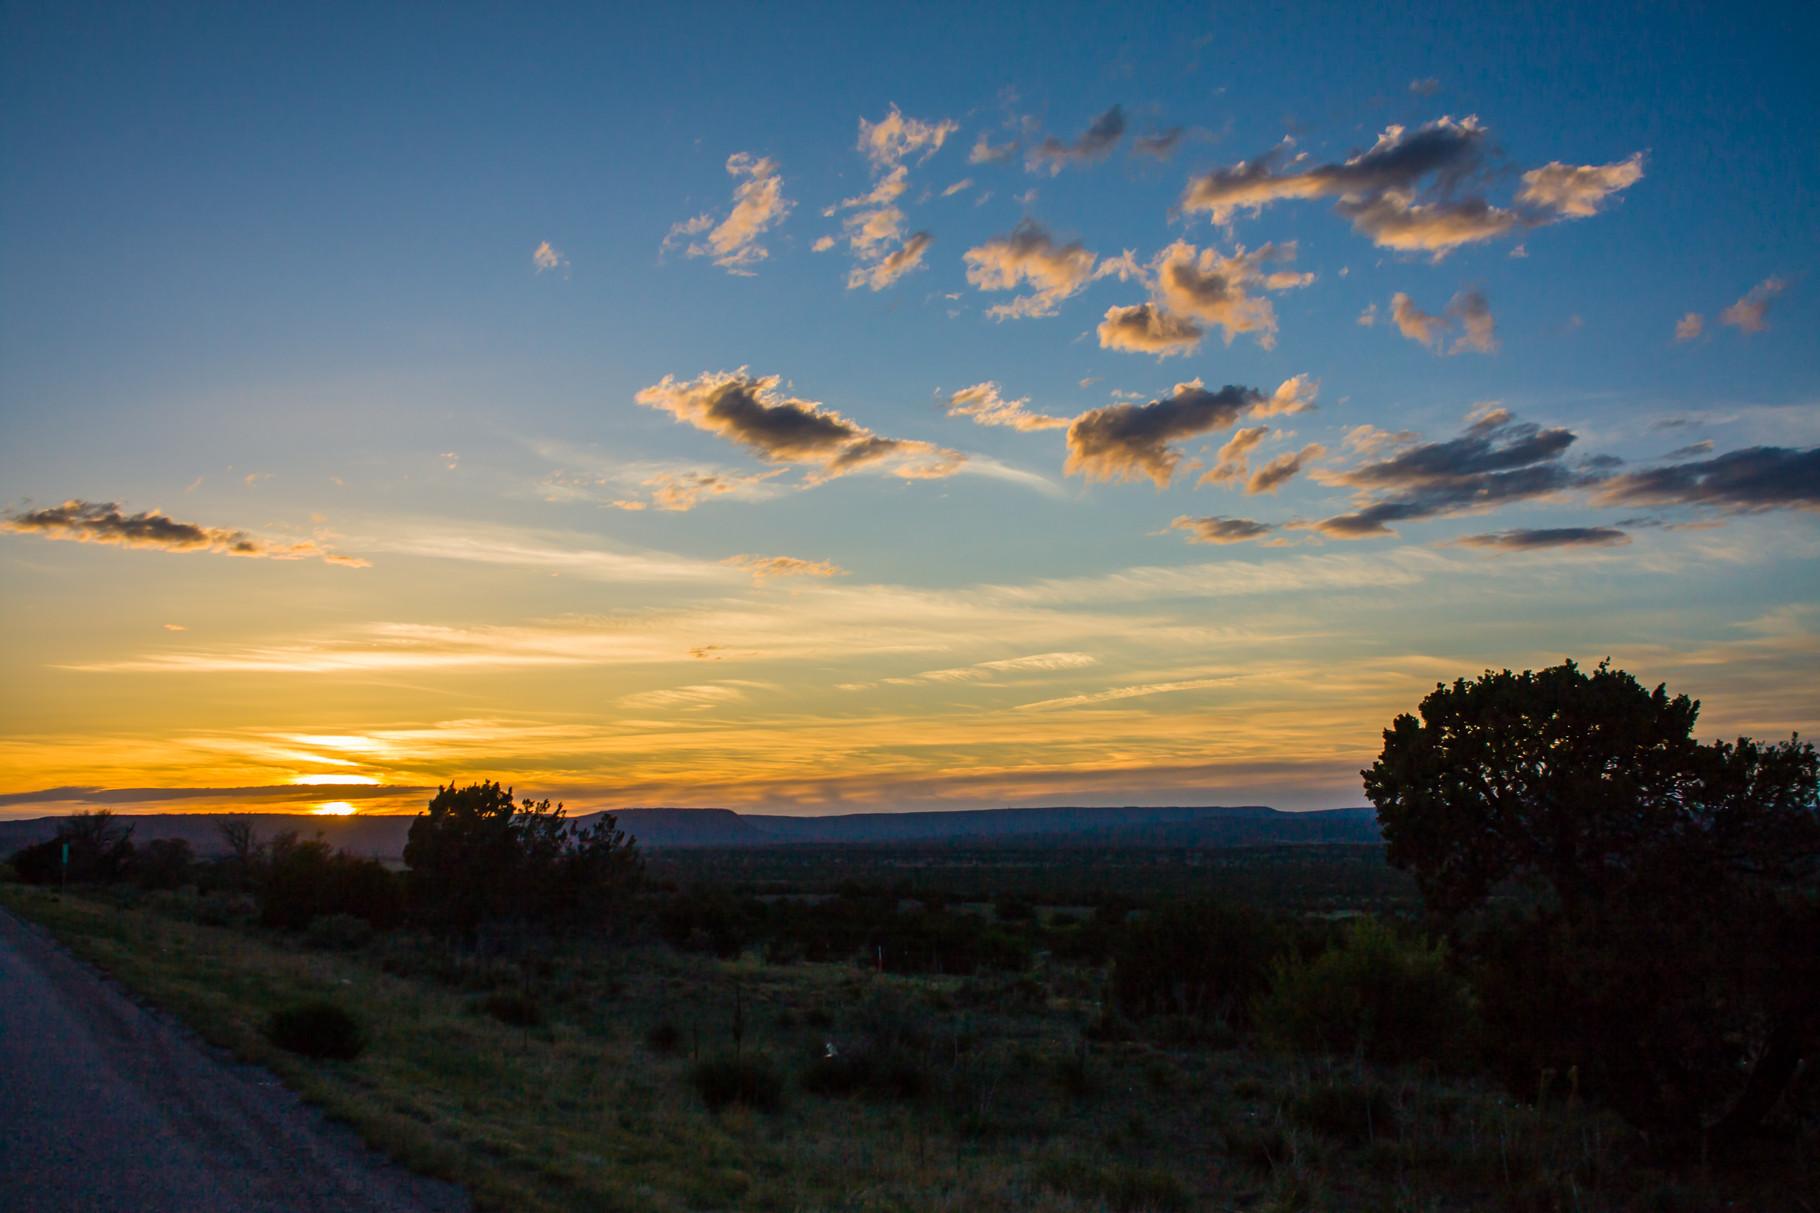 03_Auf dem Weg zum Grand Canyon in Arizona